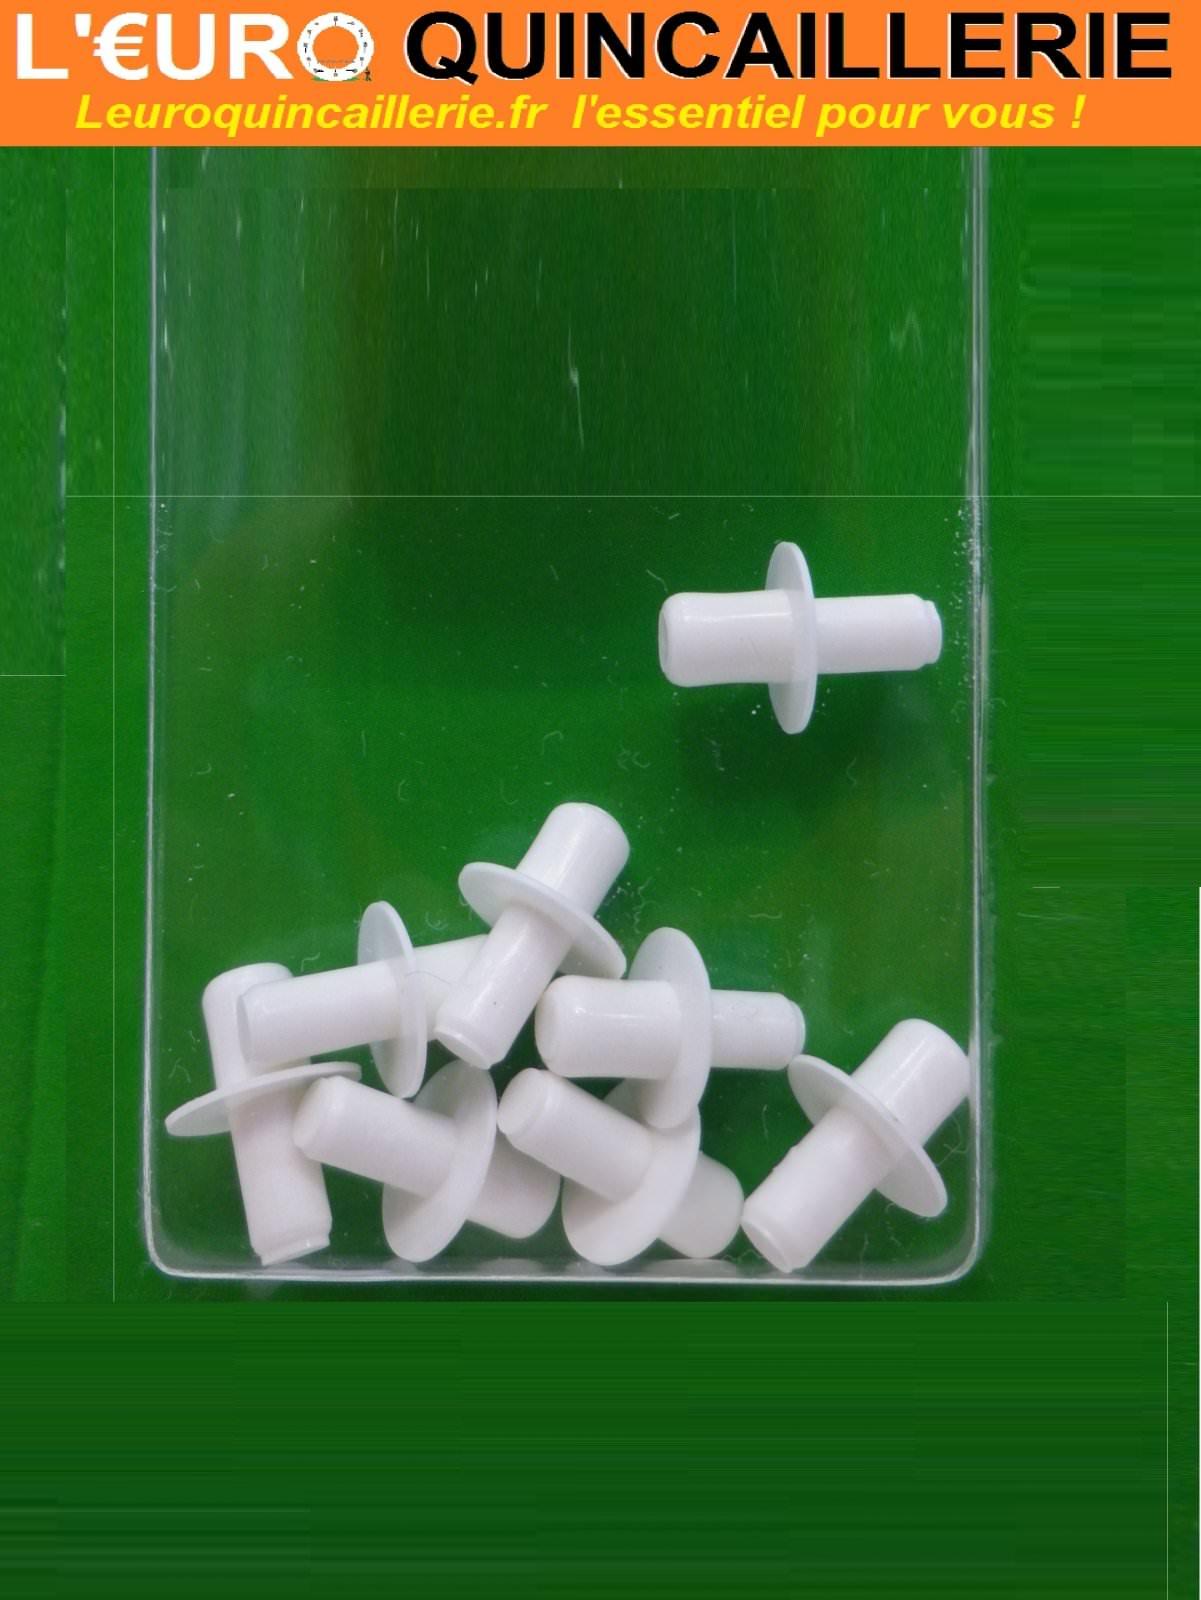 8 Taquets d'étagère cylindriques plastiques 5/6mm